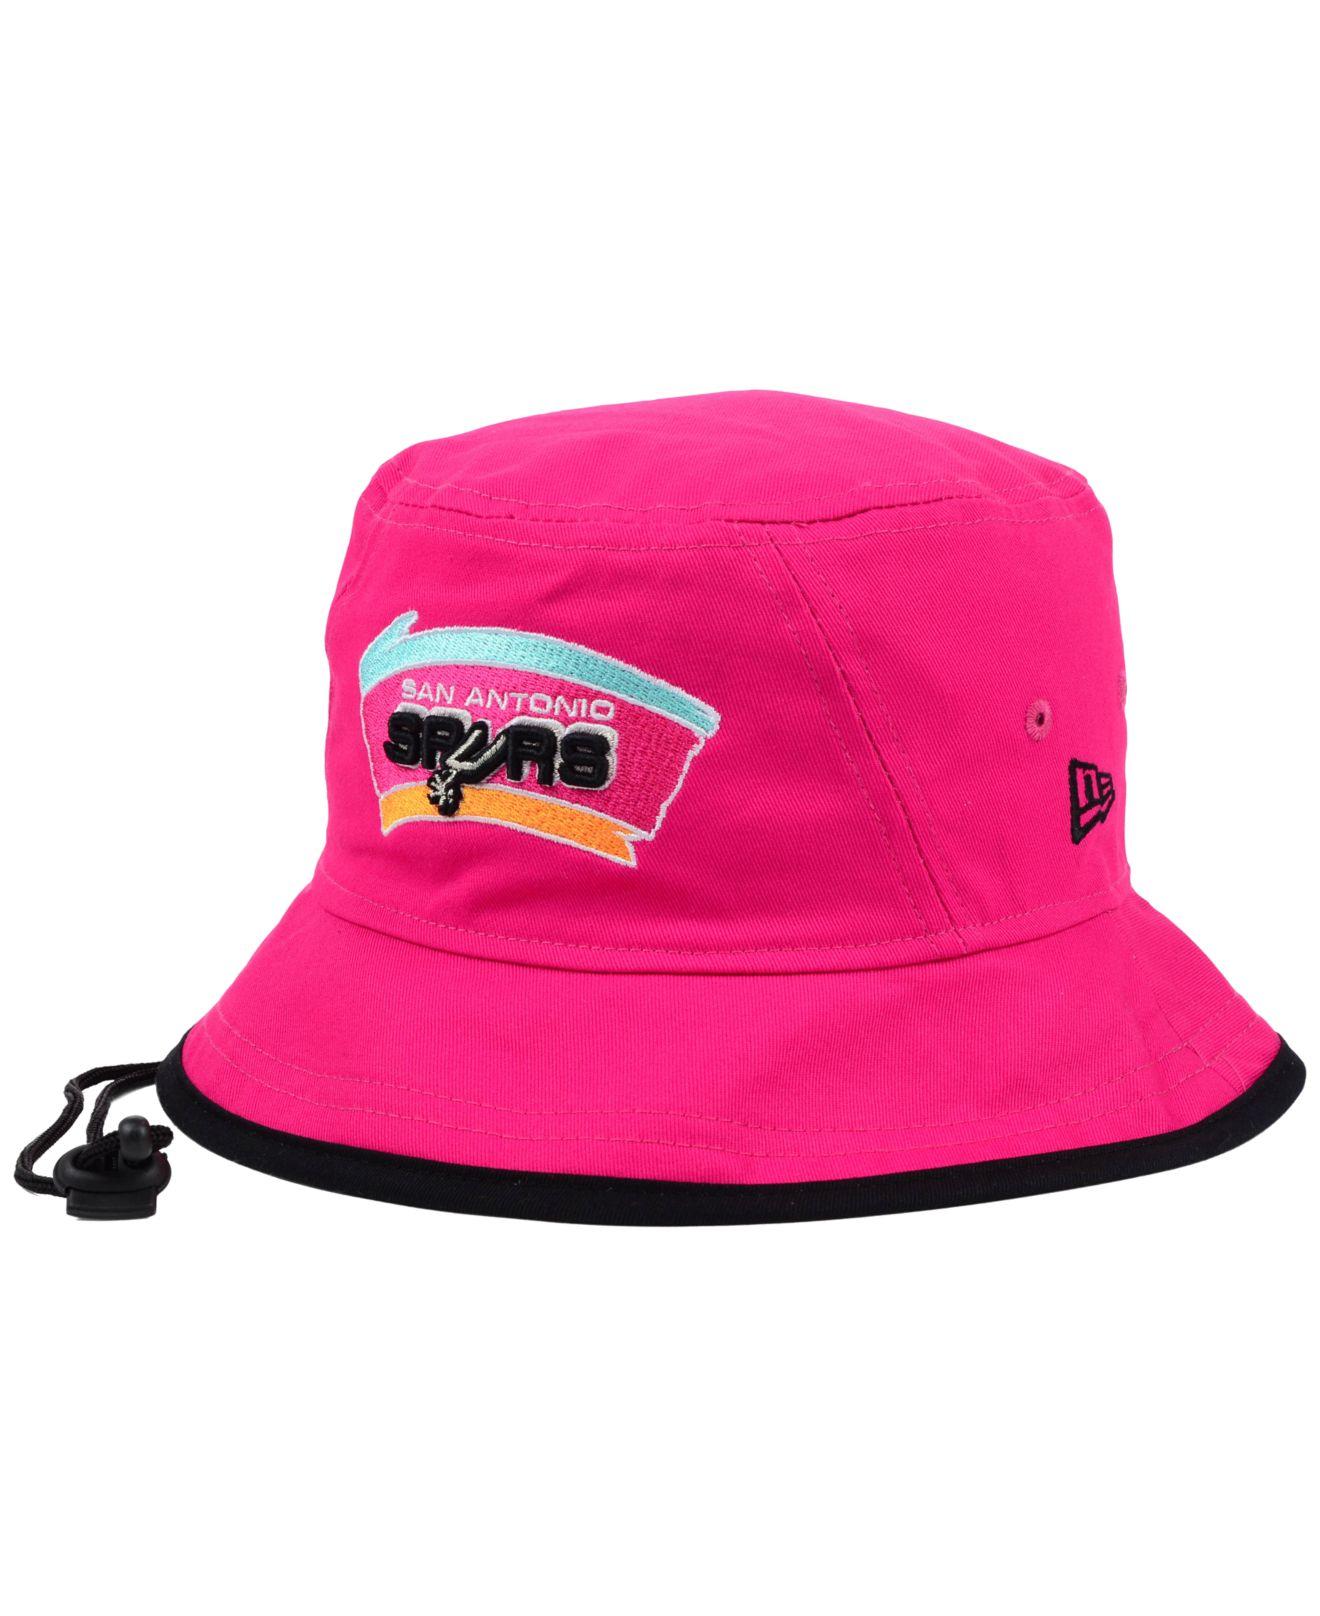 86a8ac0f6da Lyst - KTZ San Antonio Spurs Hardwood Classics Tipped Bucket Hat in ...